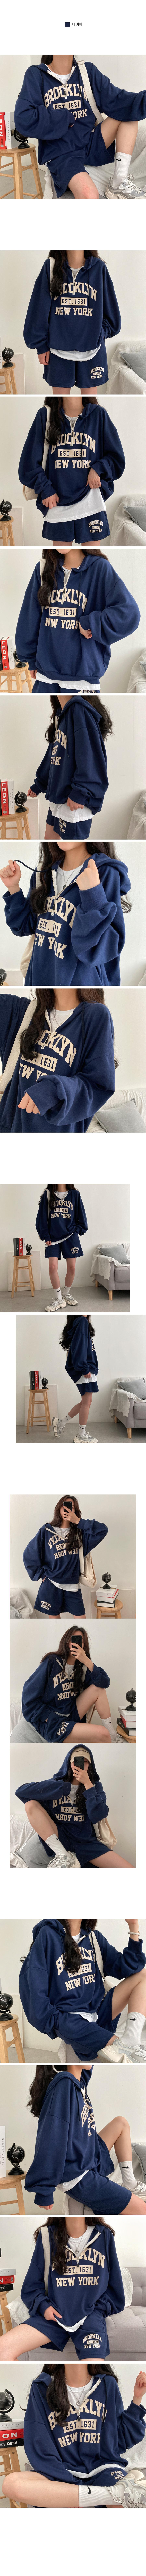 Brooklyn Hooded Shorts Training Two-Piece Set